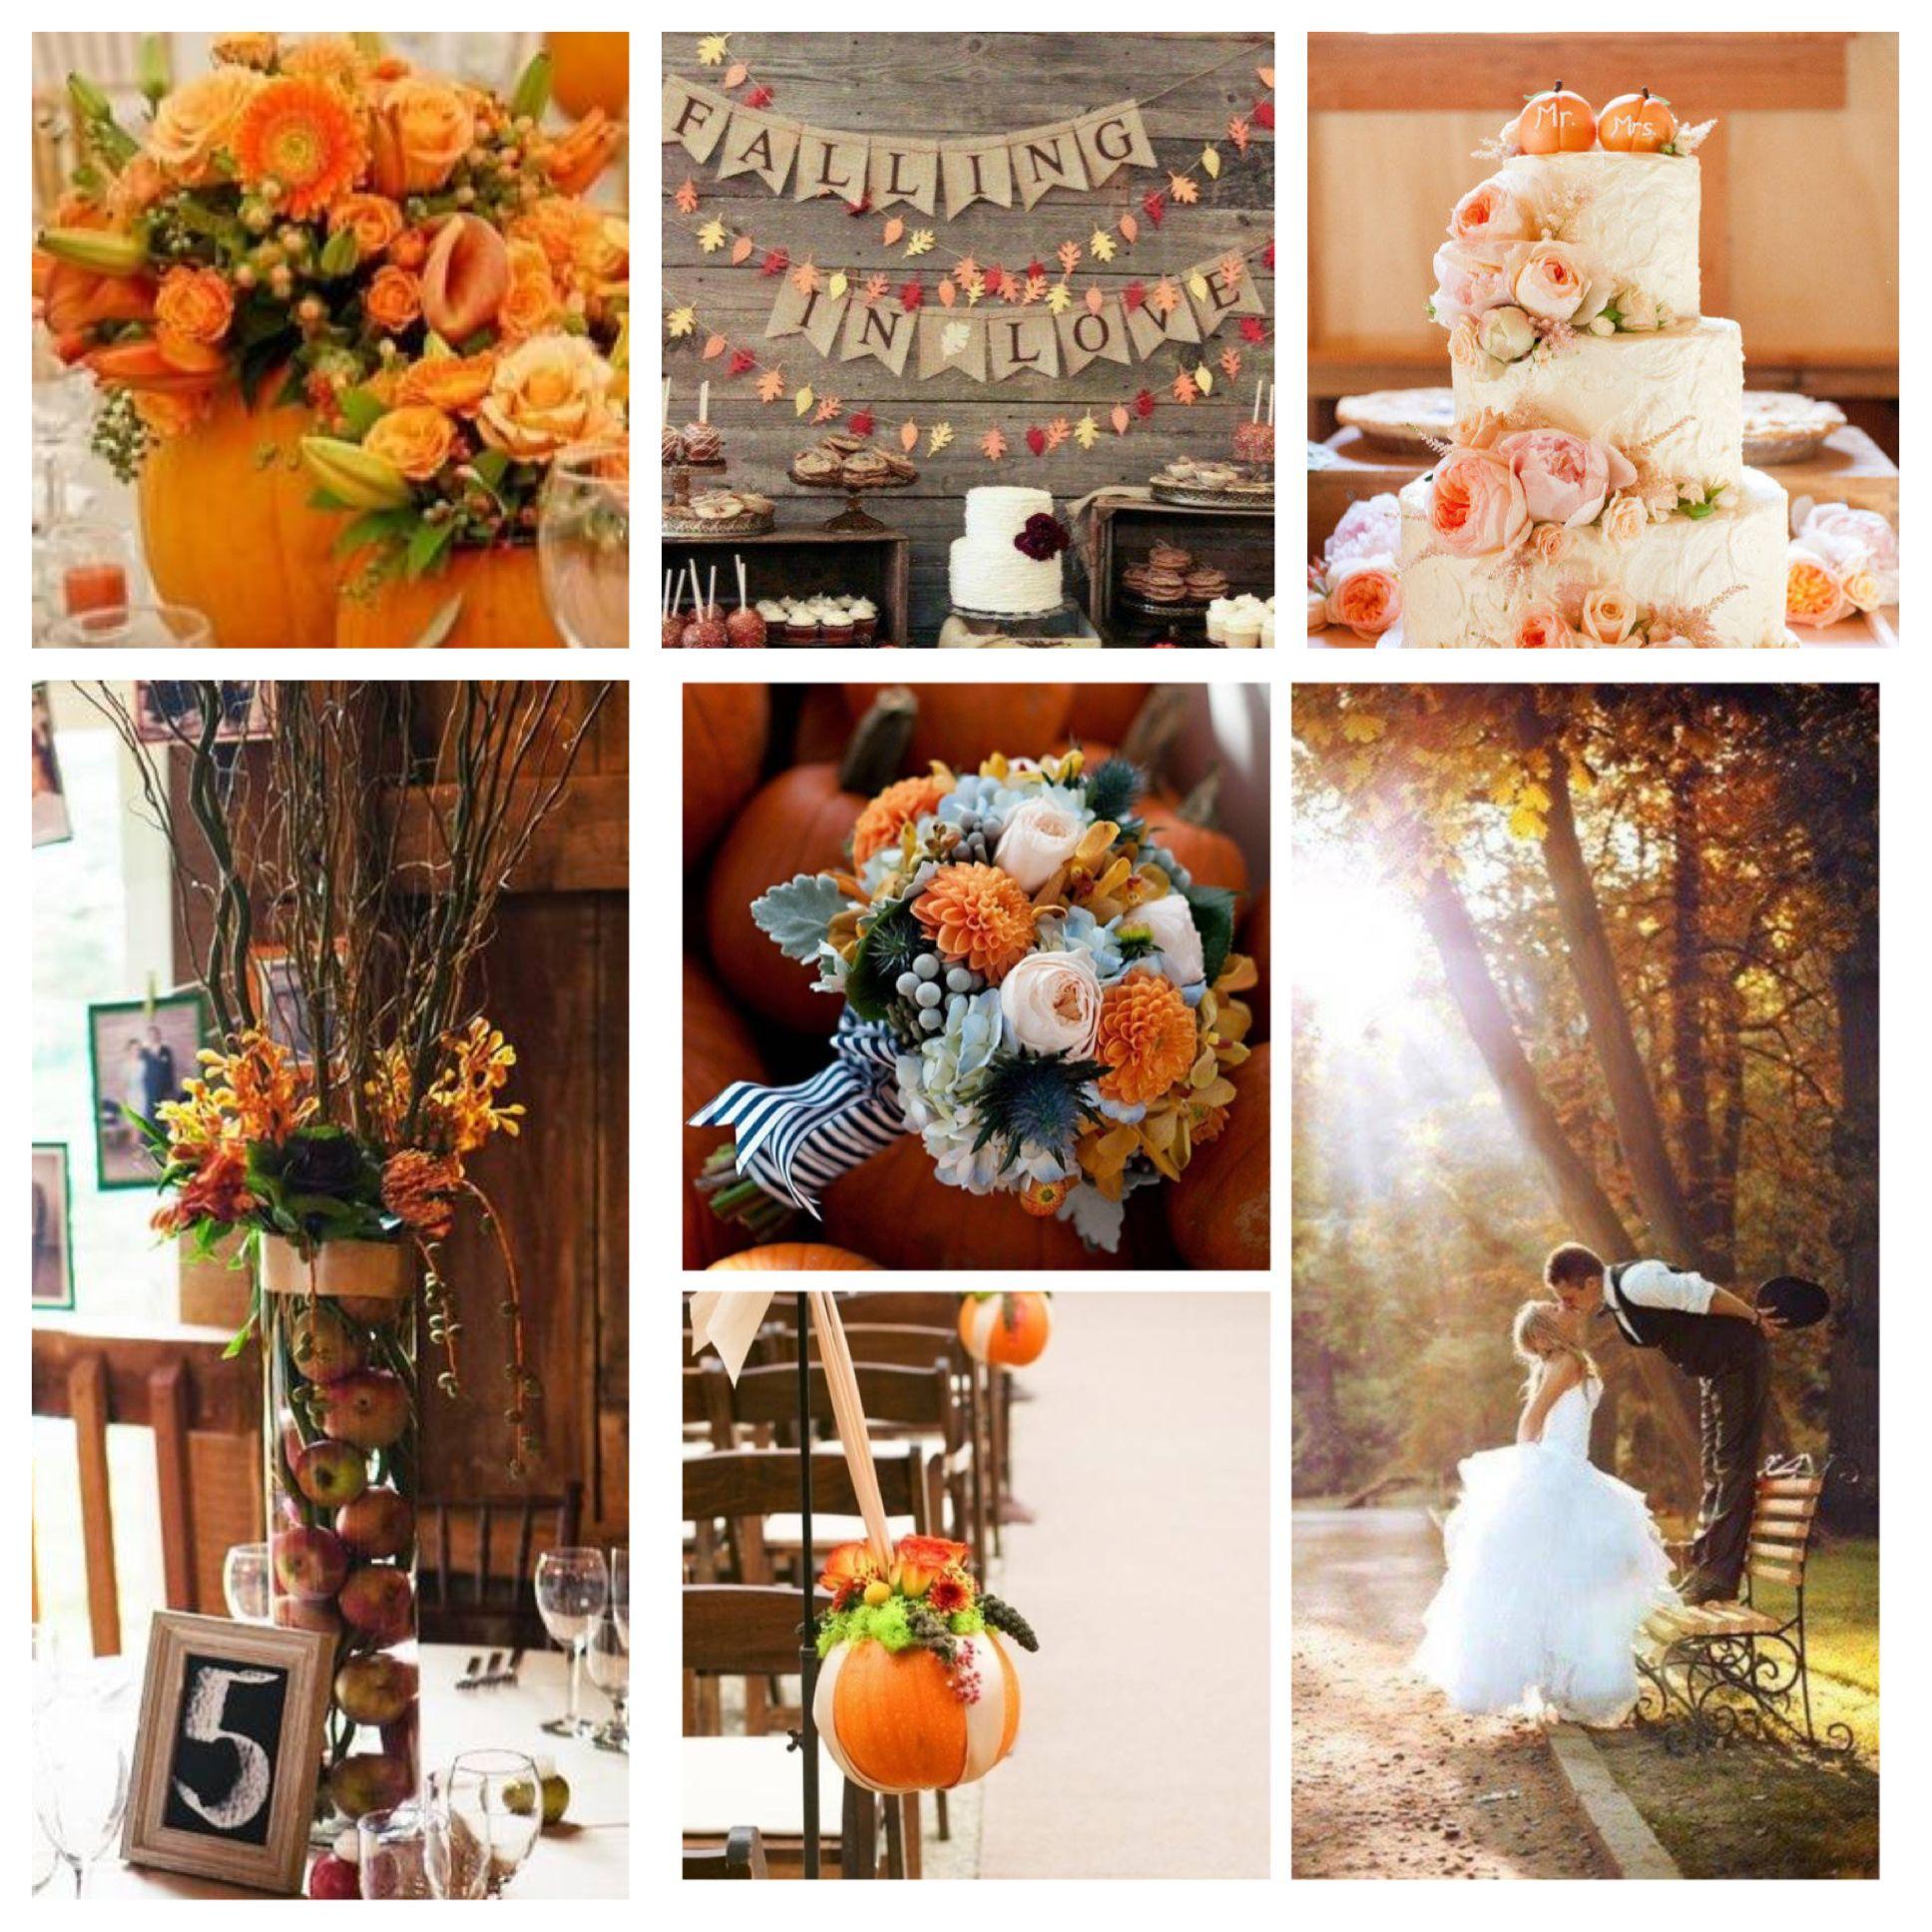 Pinterest Fall Wedding Ideas: Vow Renewal Decorations